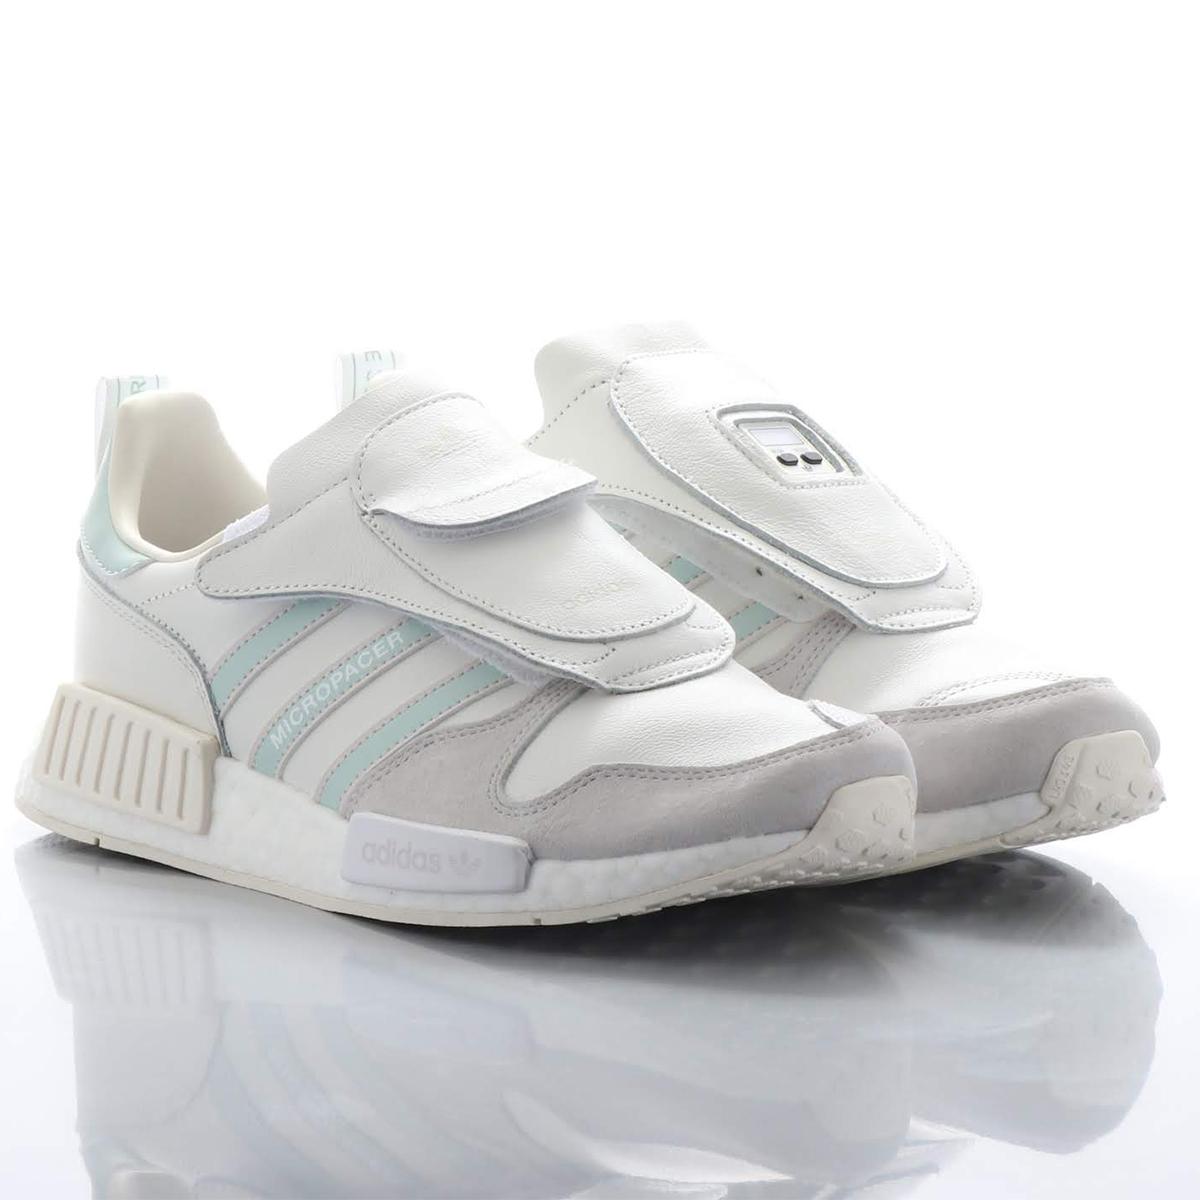 adidas Originals MICRO_R1(アディダスオリジナルス マイクロ_R1)RUNNING WHITE / CLOUD WHITE / GREY【メンズ レディース スニーカー】18FW-S